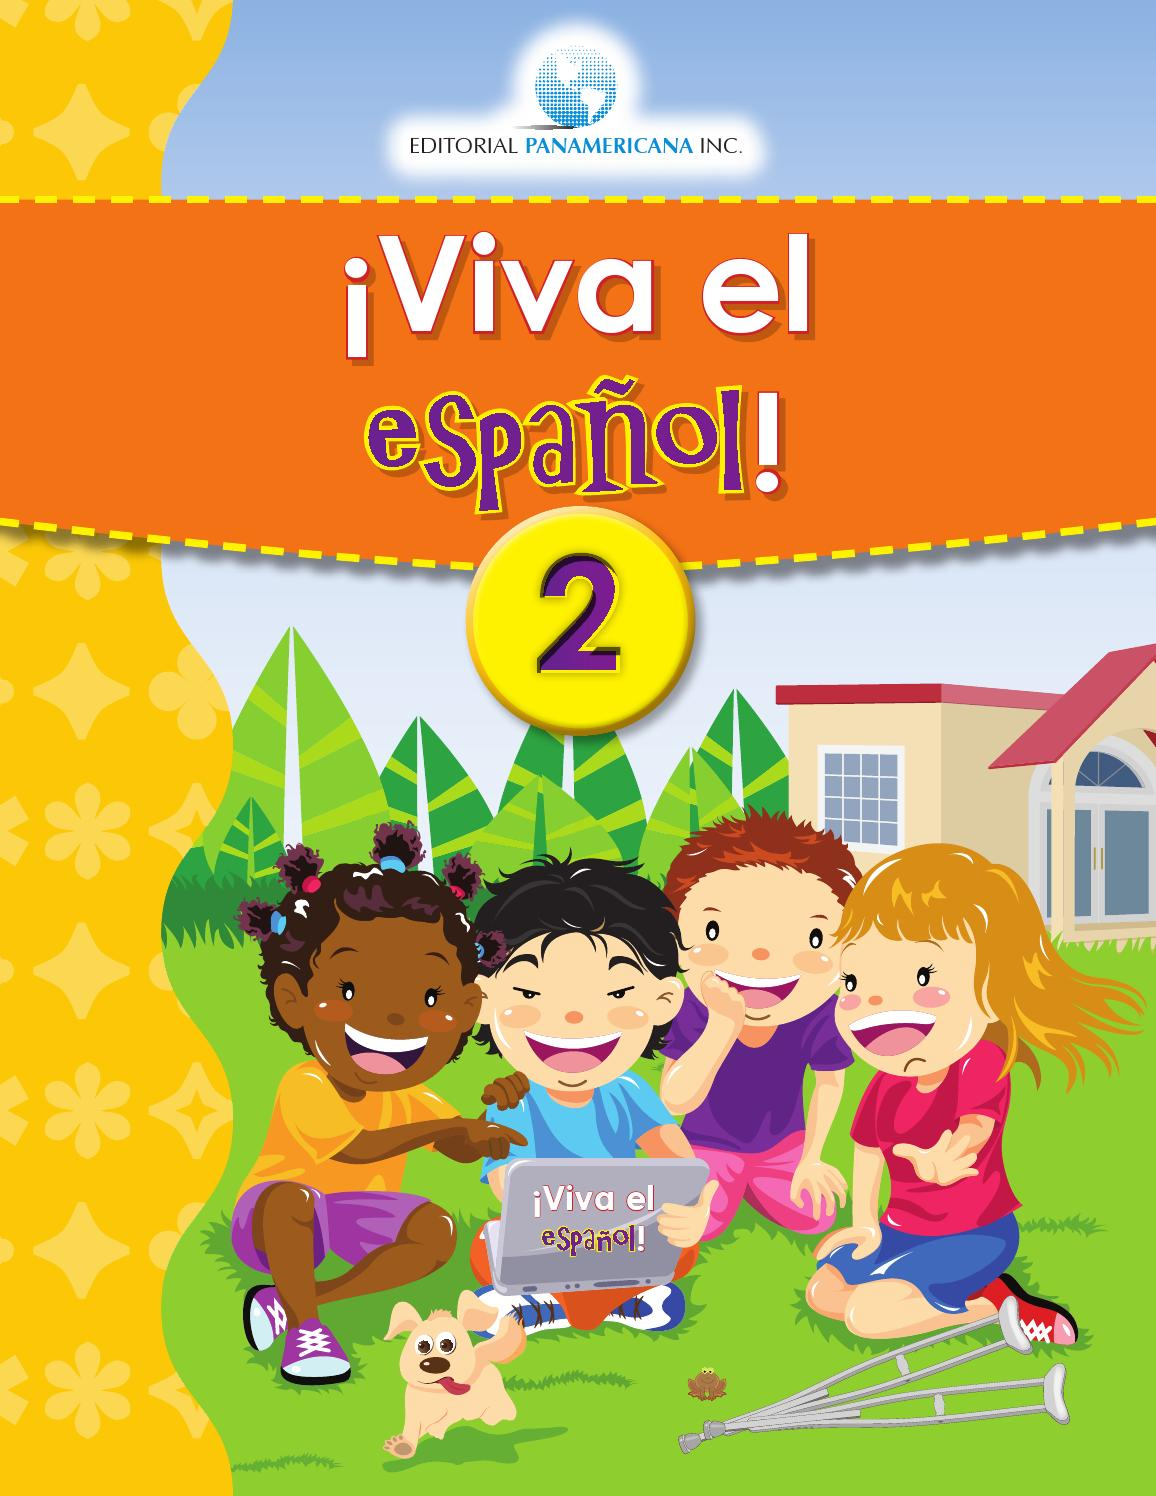 Viva el español 2 by Editorial Panamericana Inc. - issuu